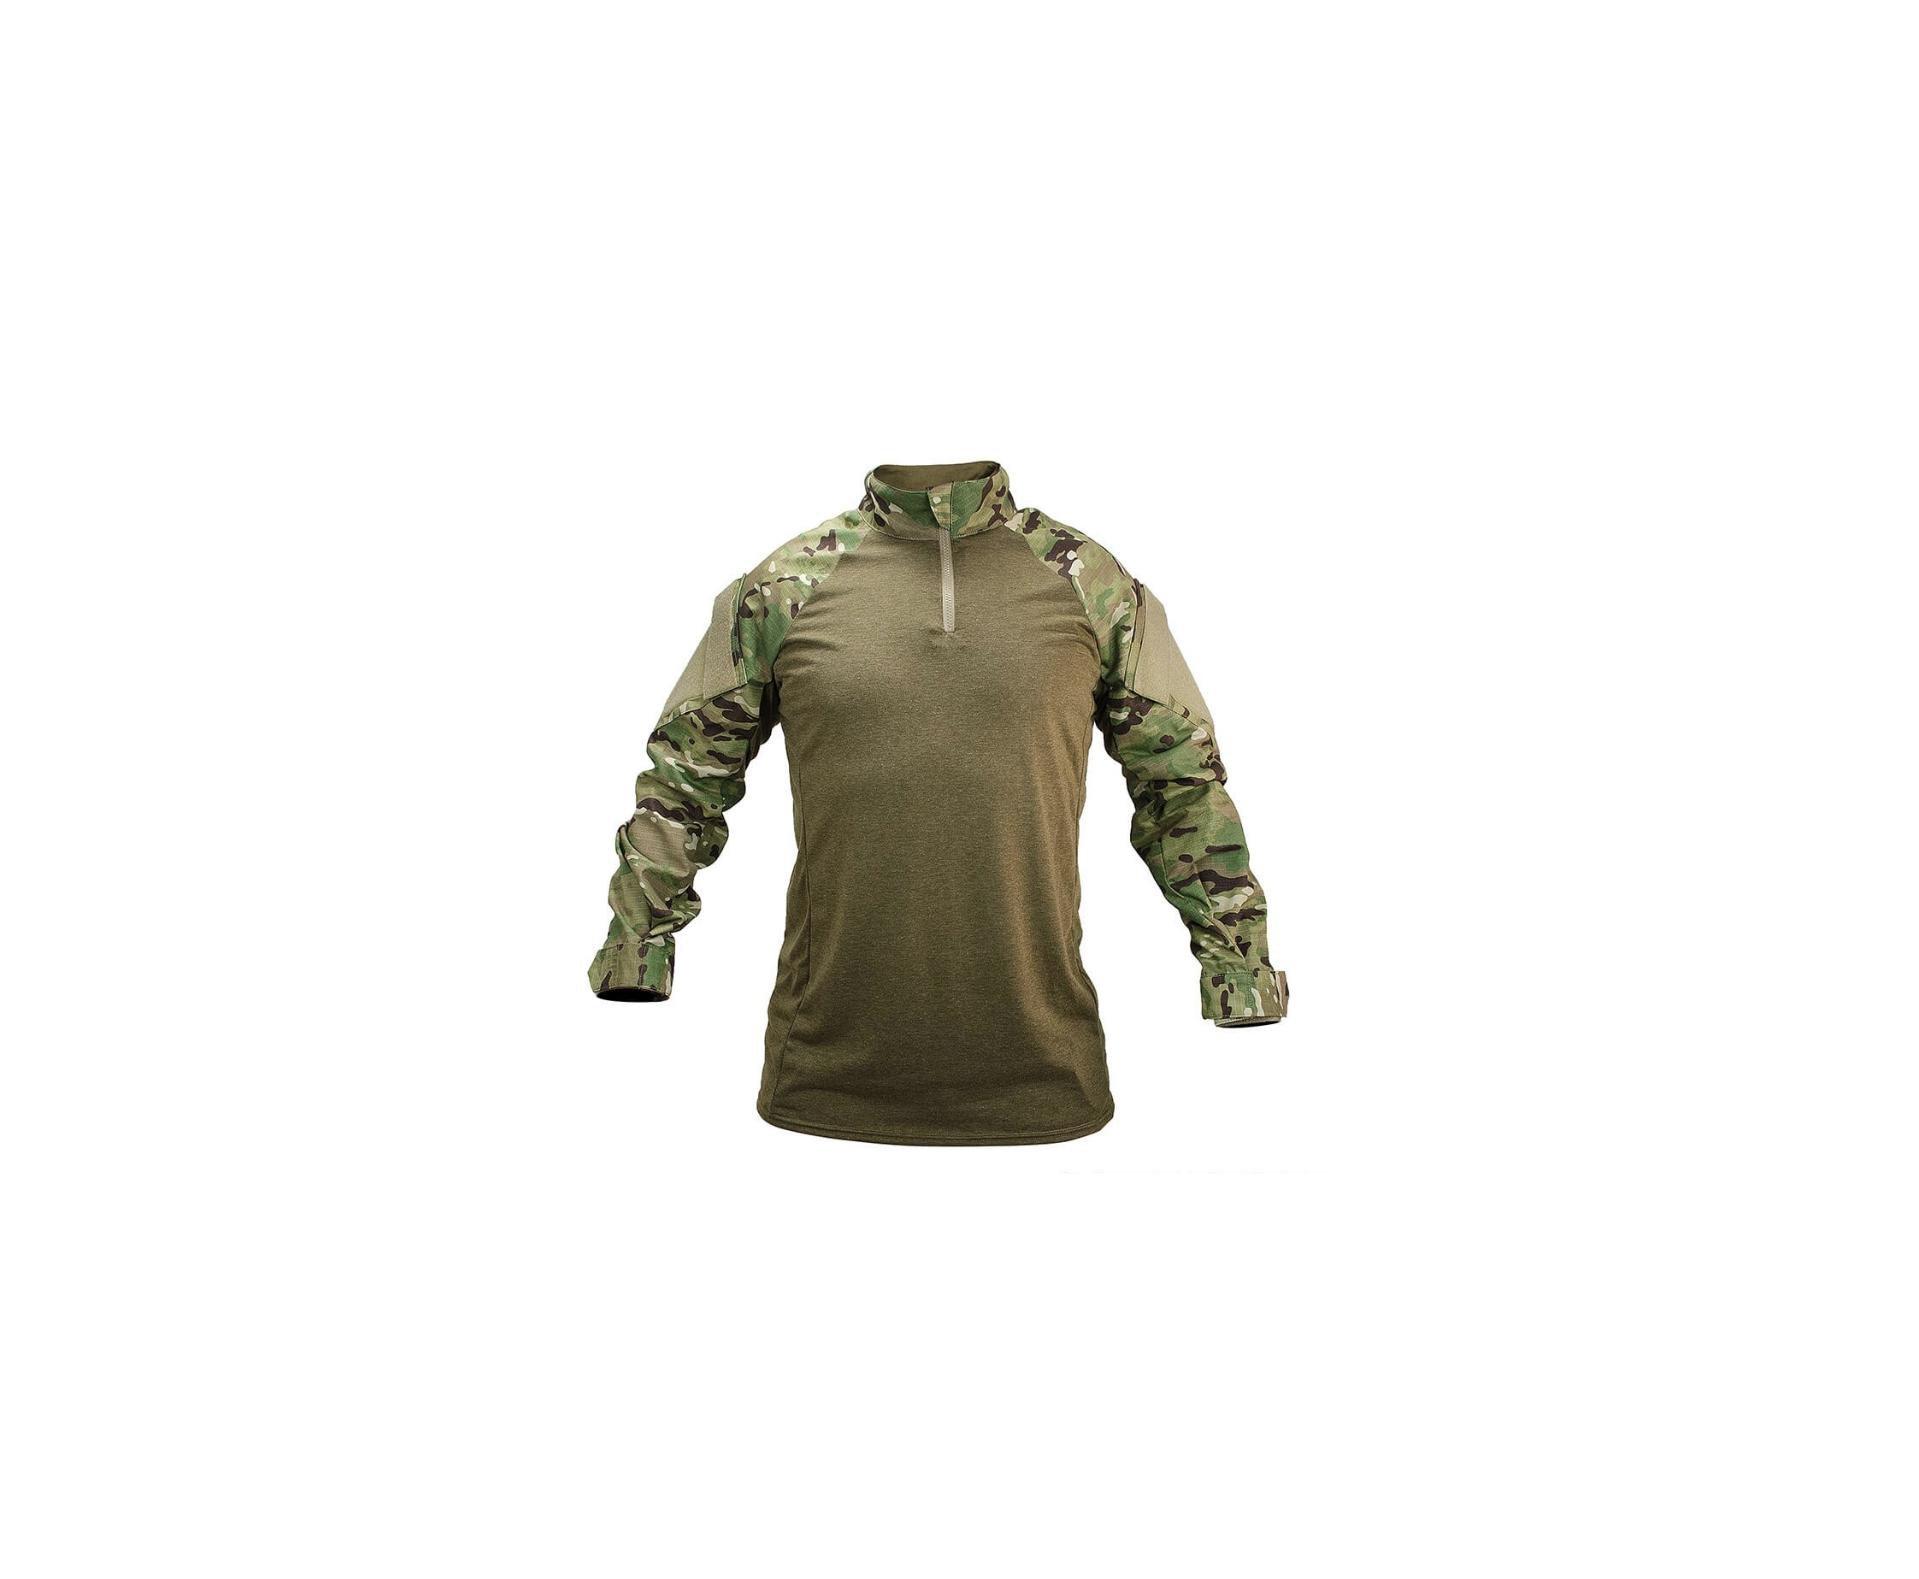 Camisa De Combate For Honor Adulto Poliester 711 Camuflado Multicam  - M